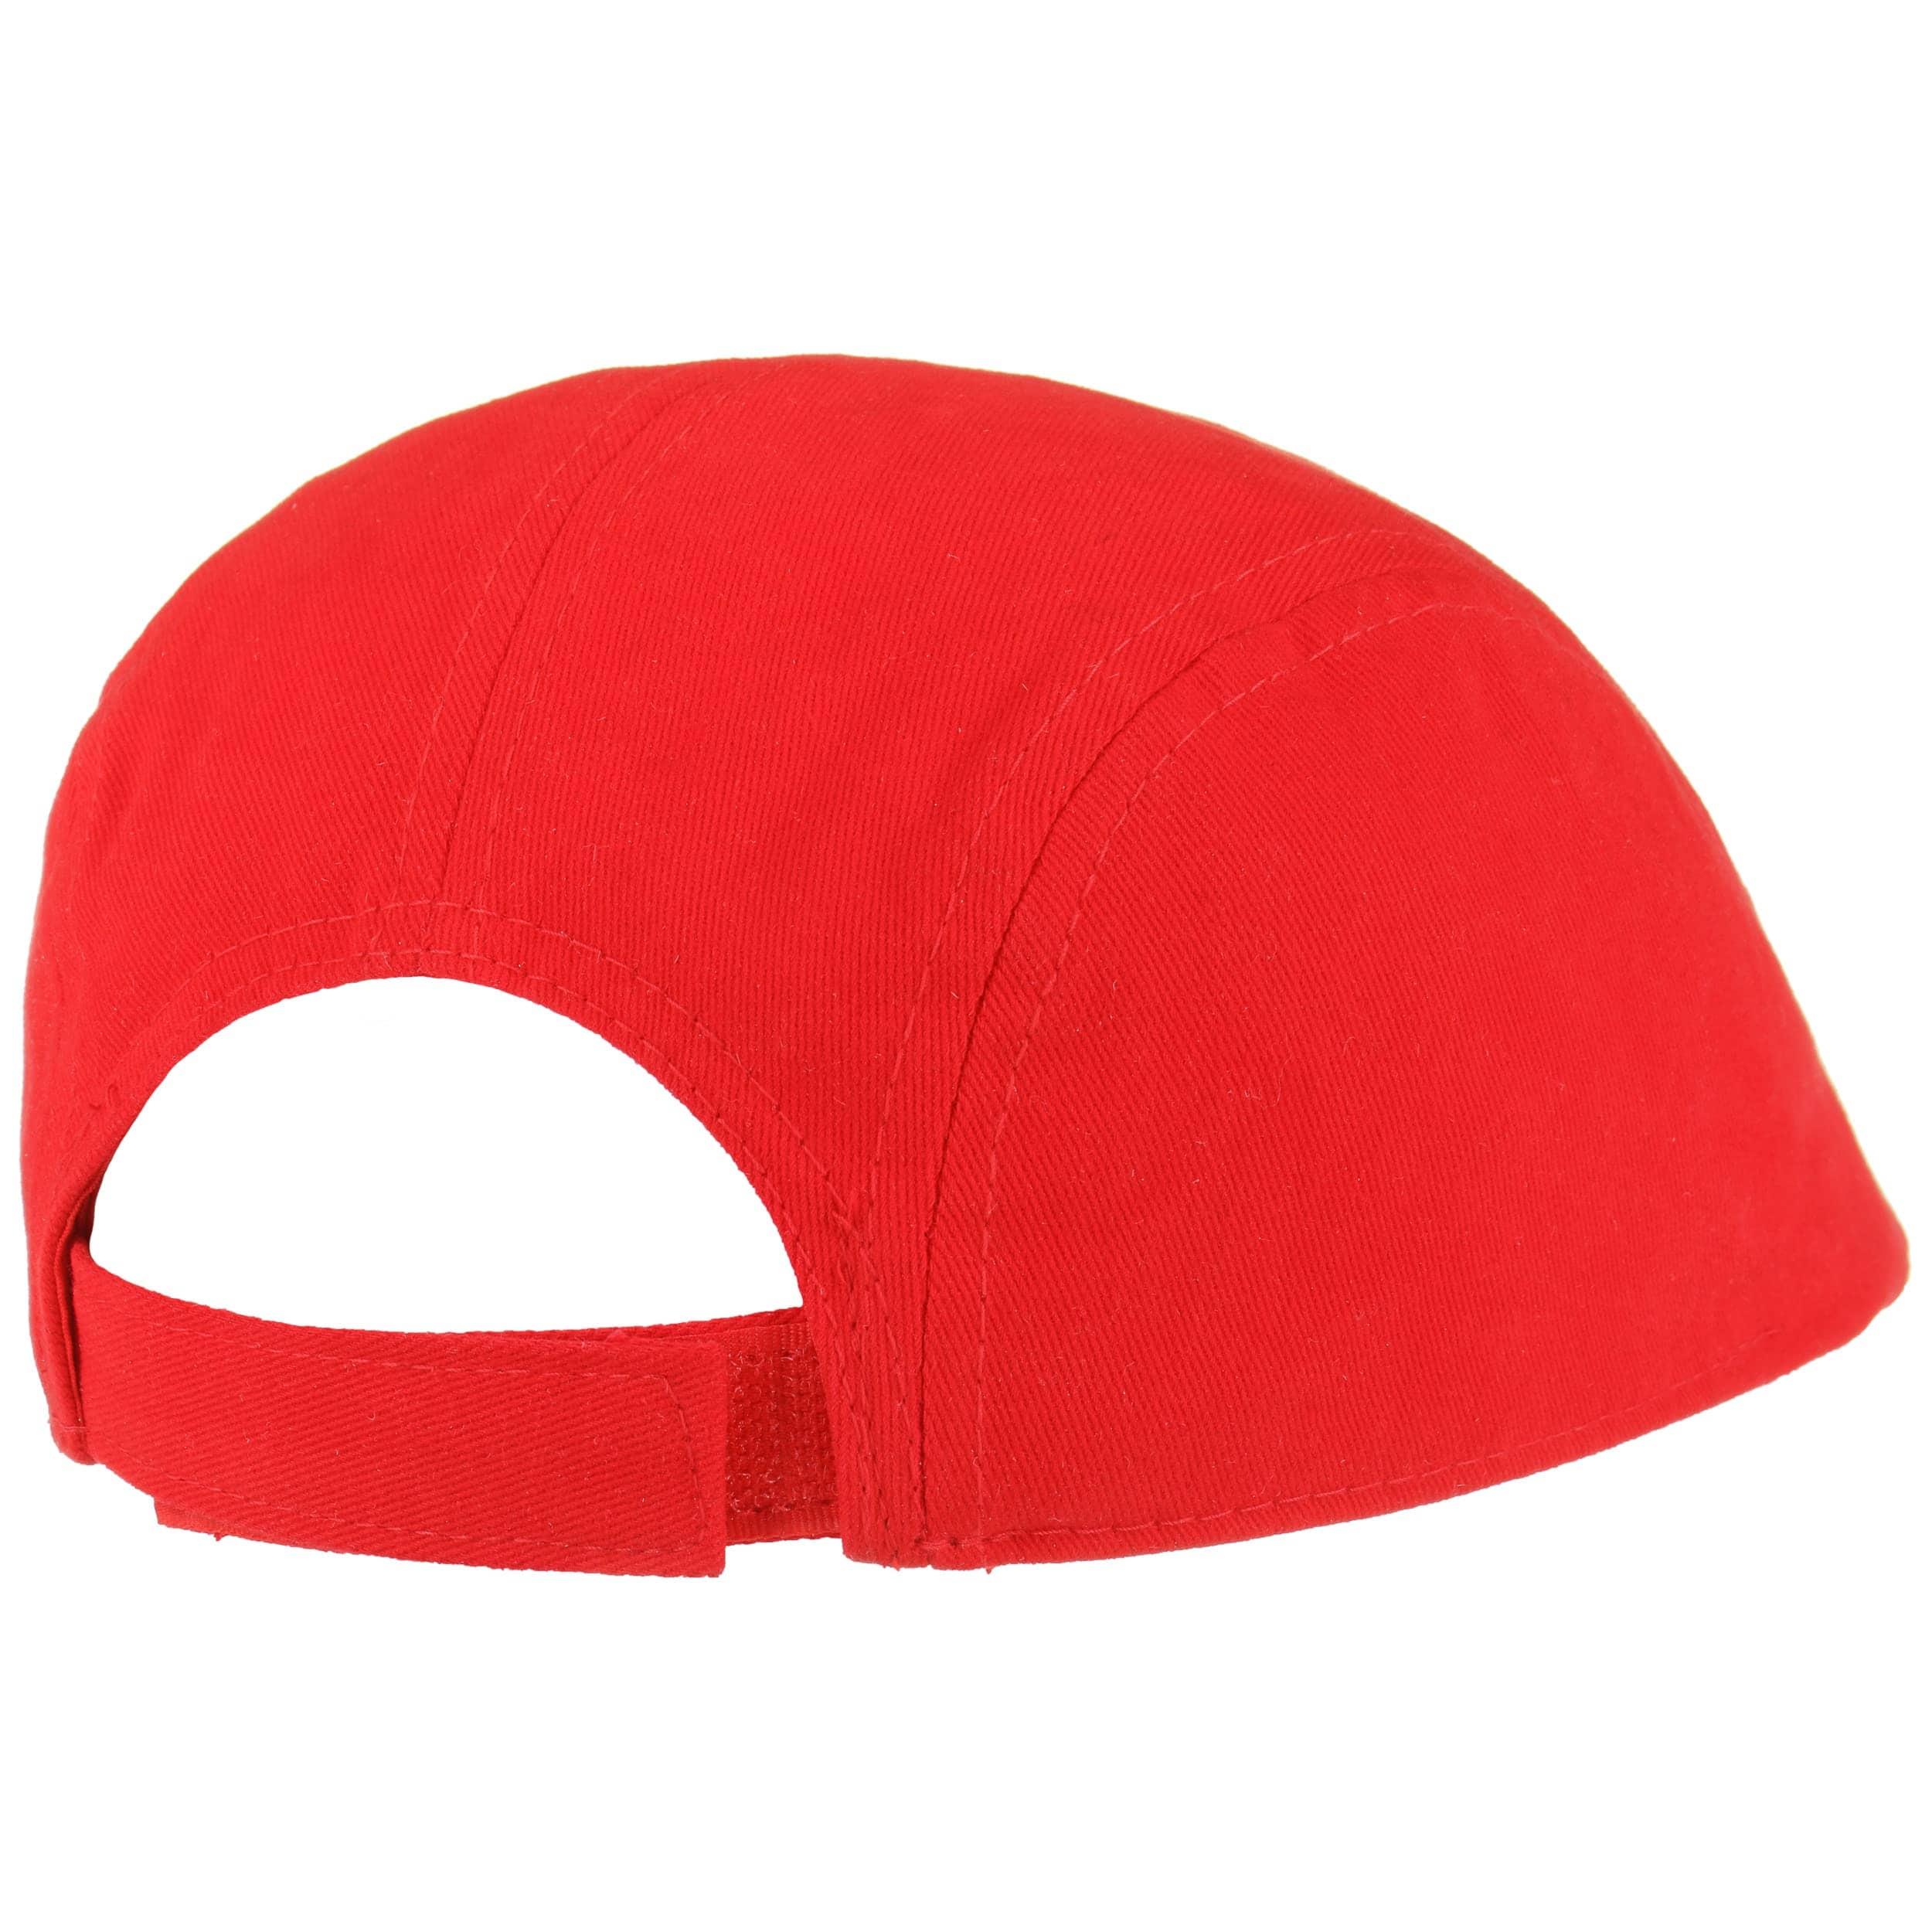 Gorra Gatsby Swing - Gorras - sombreroshop.es f109021d9f3